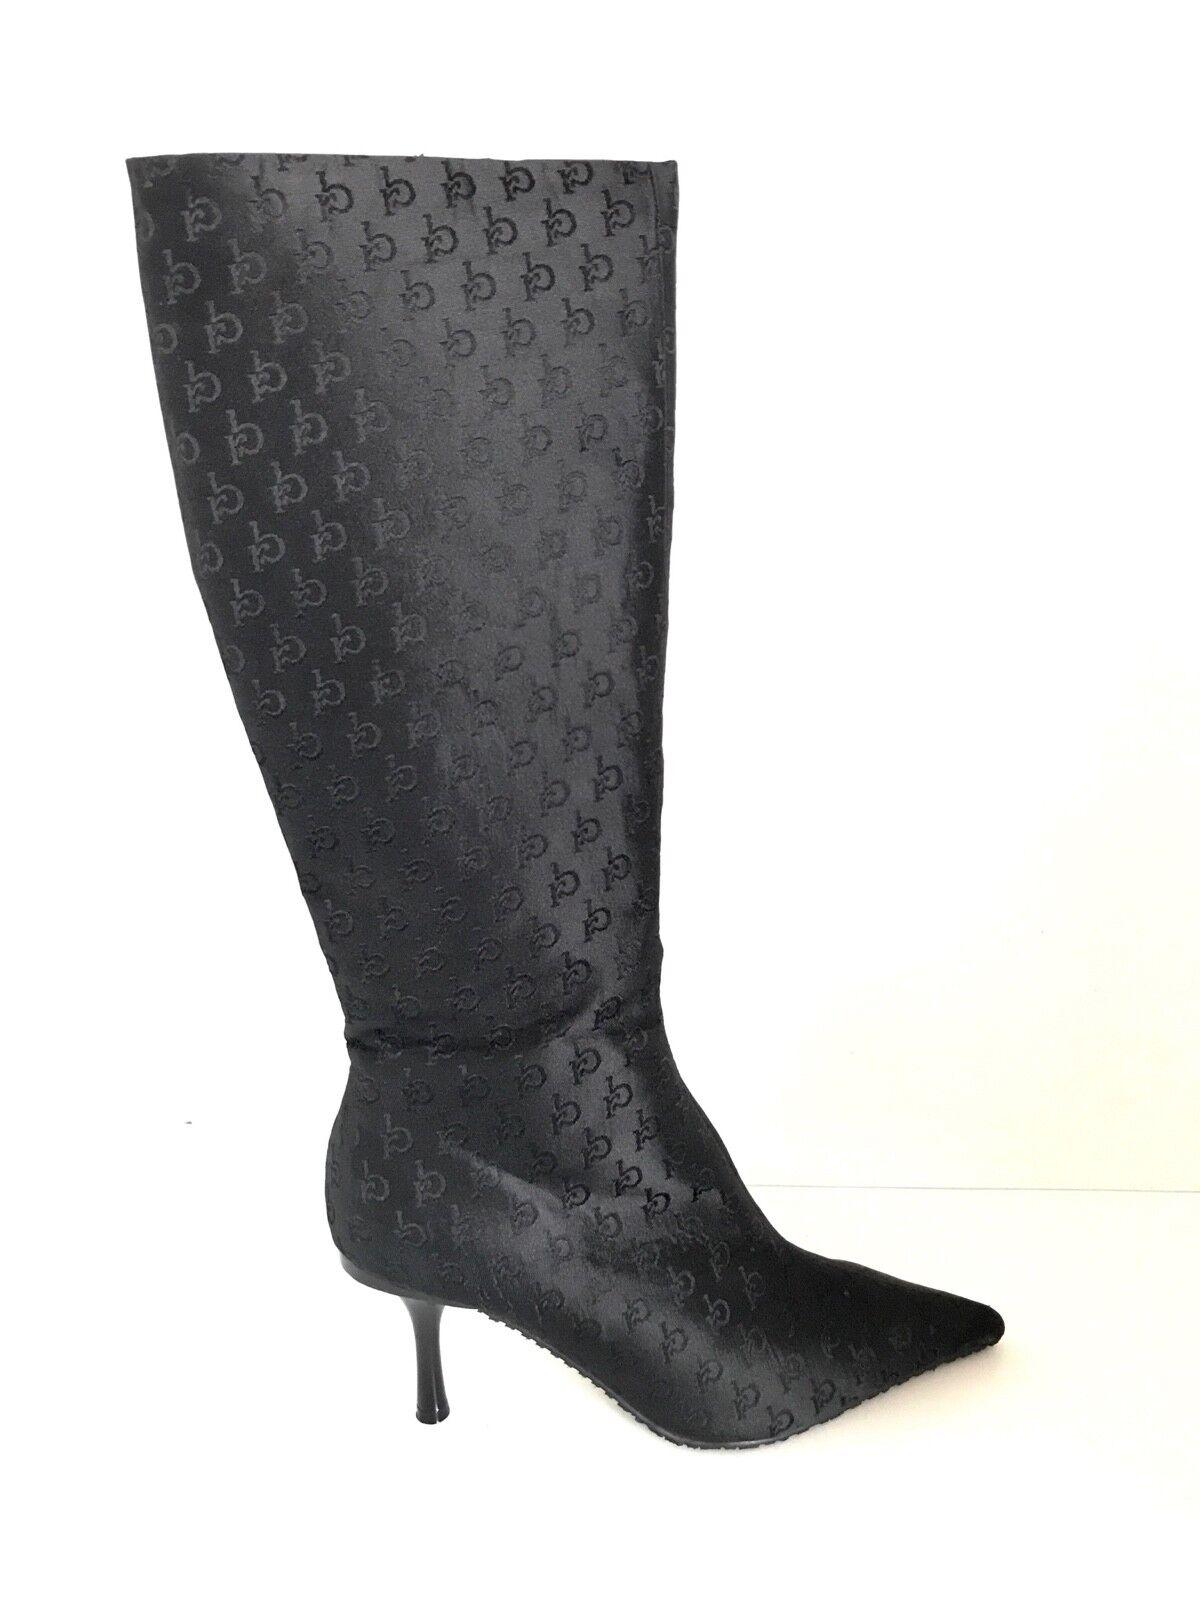 ROCCO BAROCCO botte n. 37 femme ROCW51 noir tissu